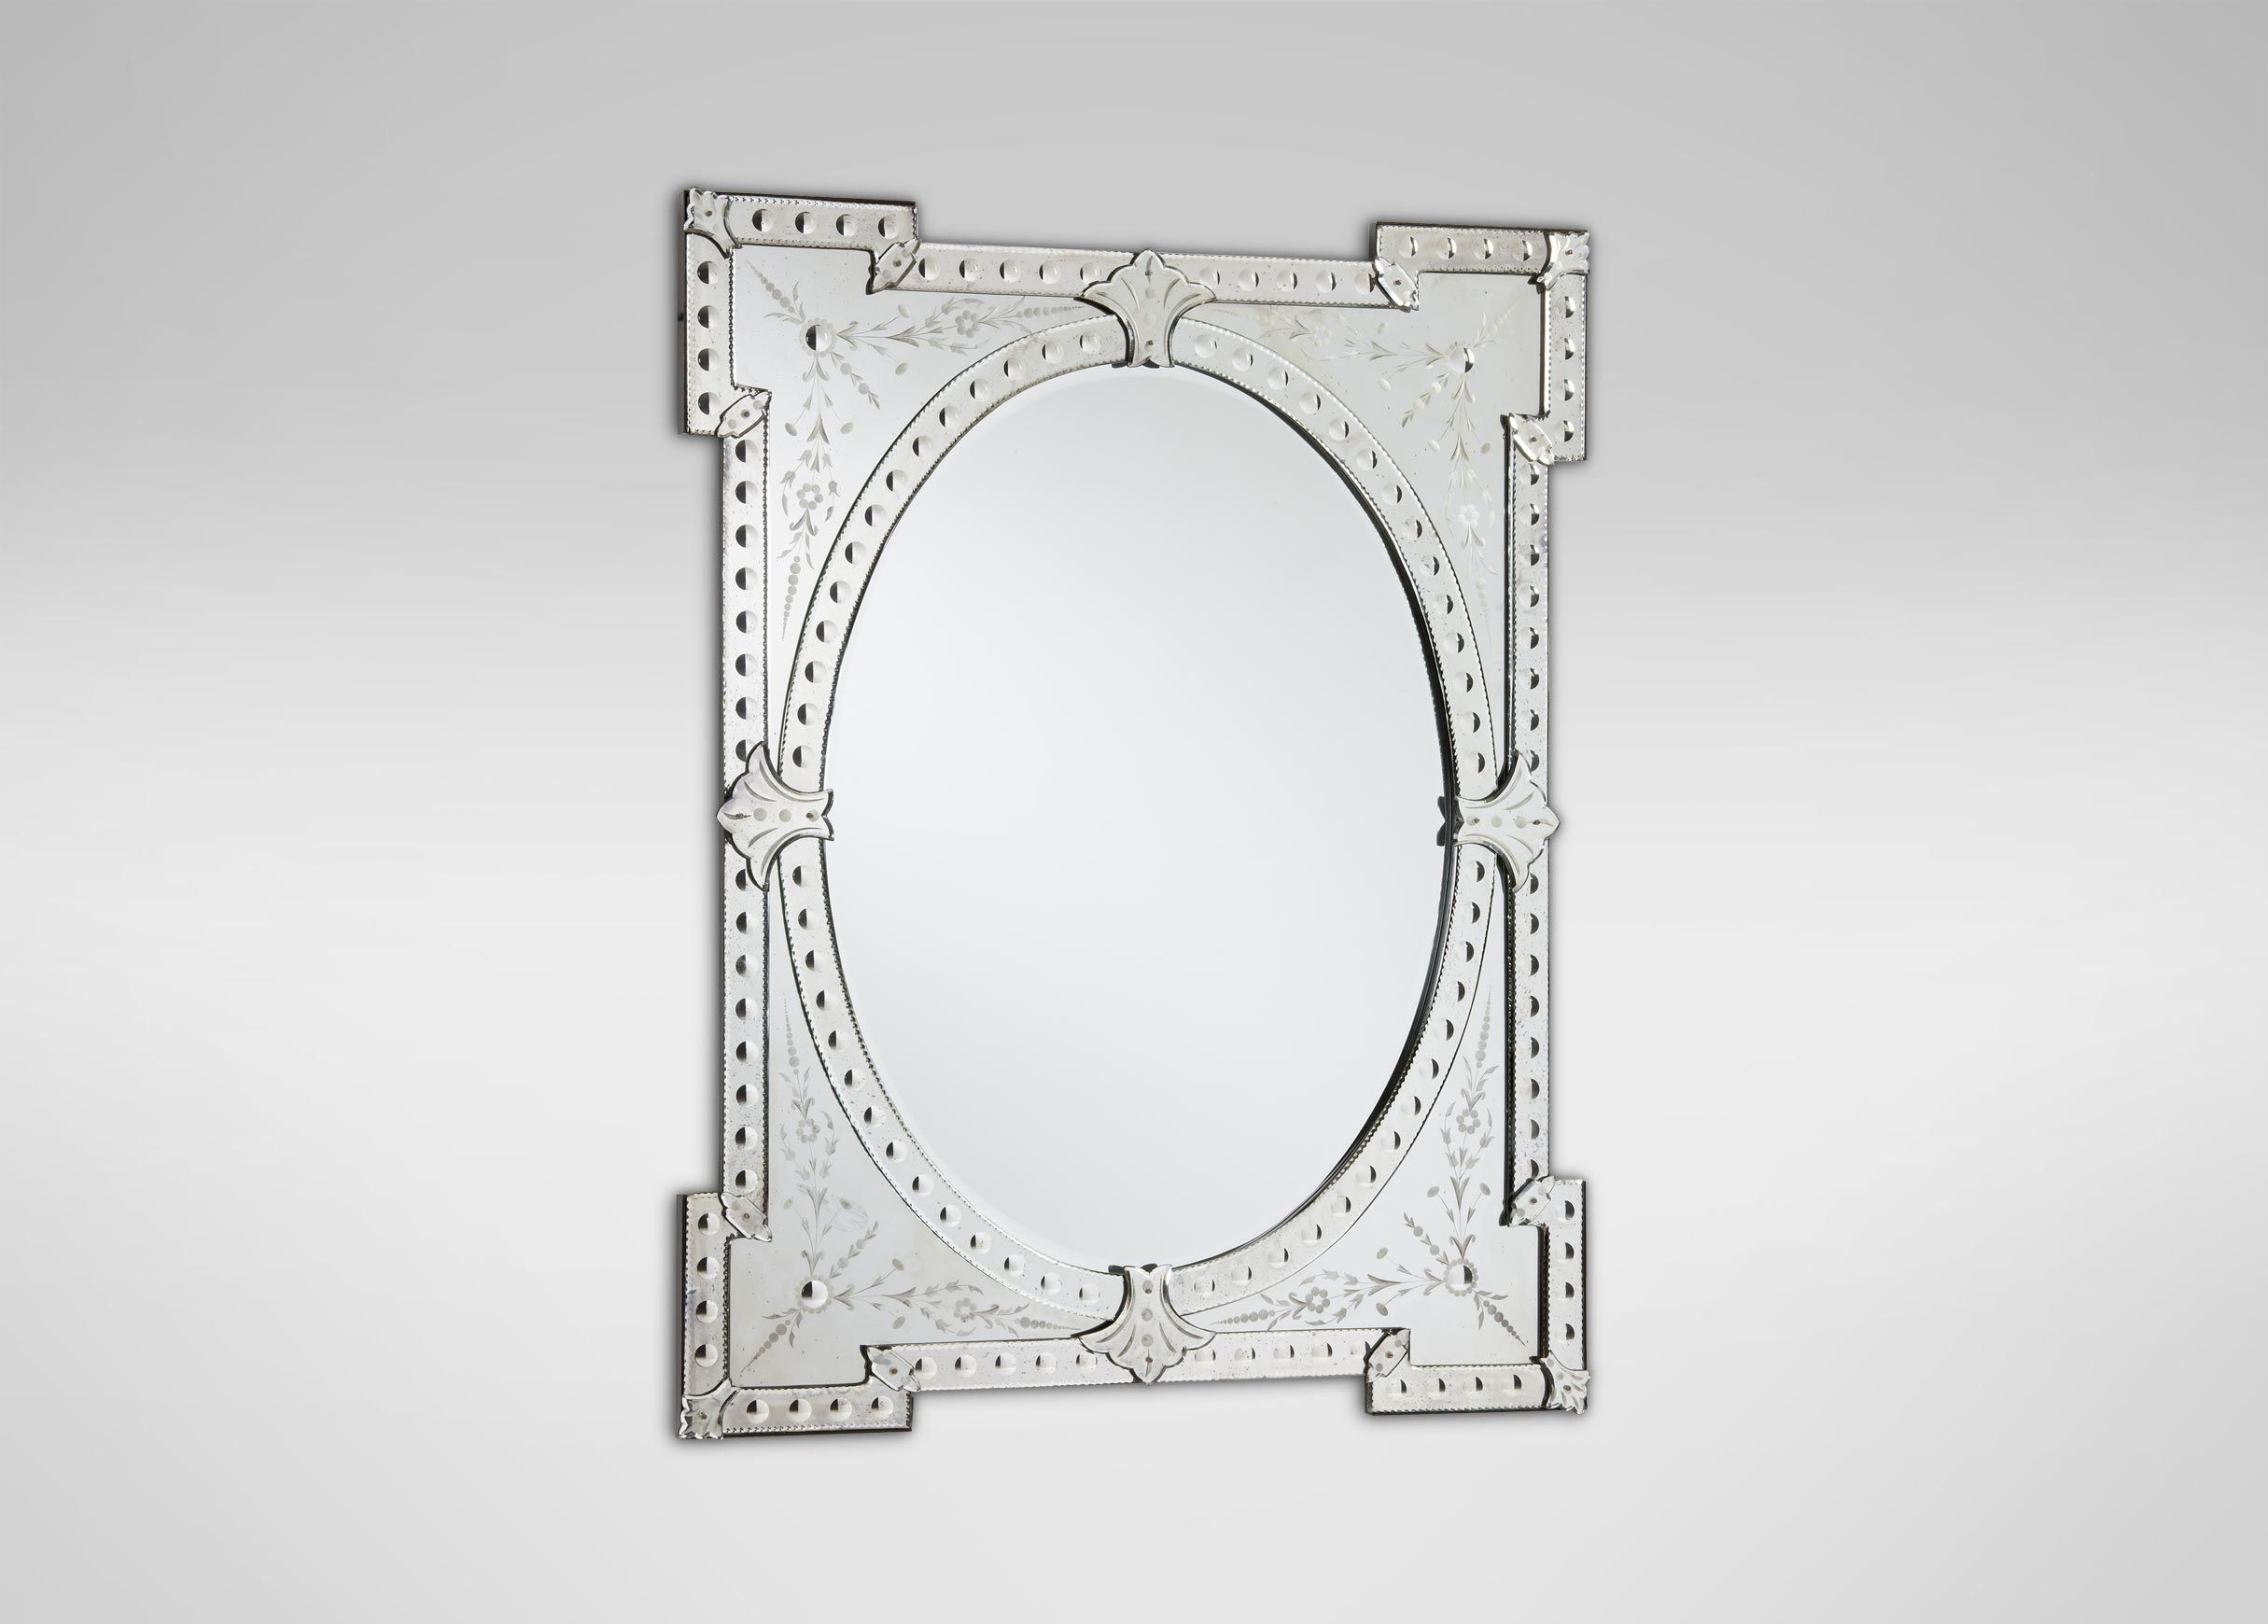 Corner Square Venetian Mirror Teal Dining Room Pinterest Throughout Square Venetian Mirror (View 12 of 15)